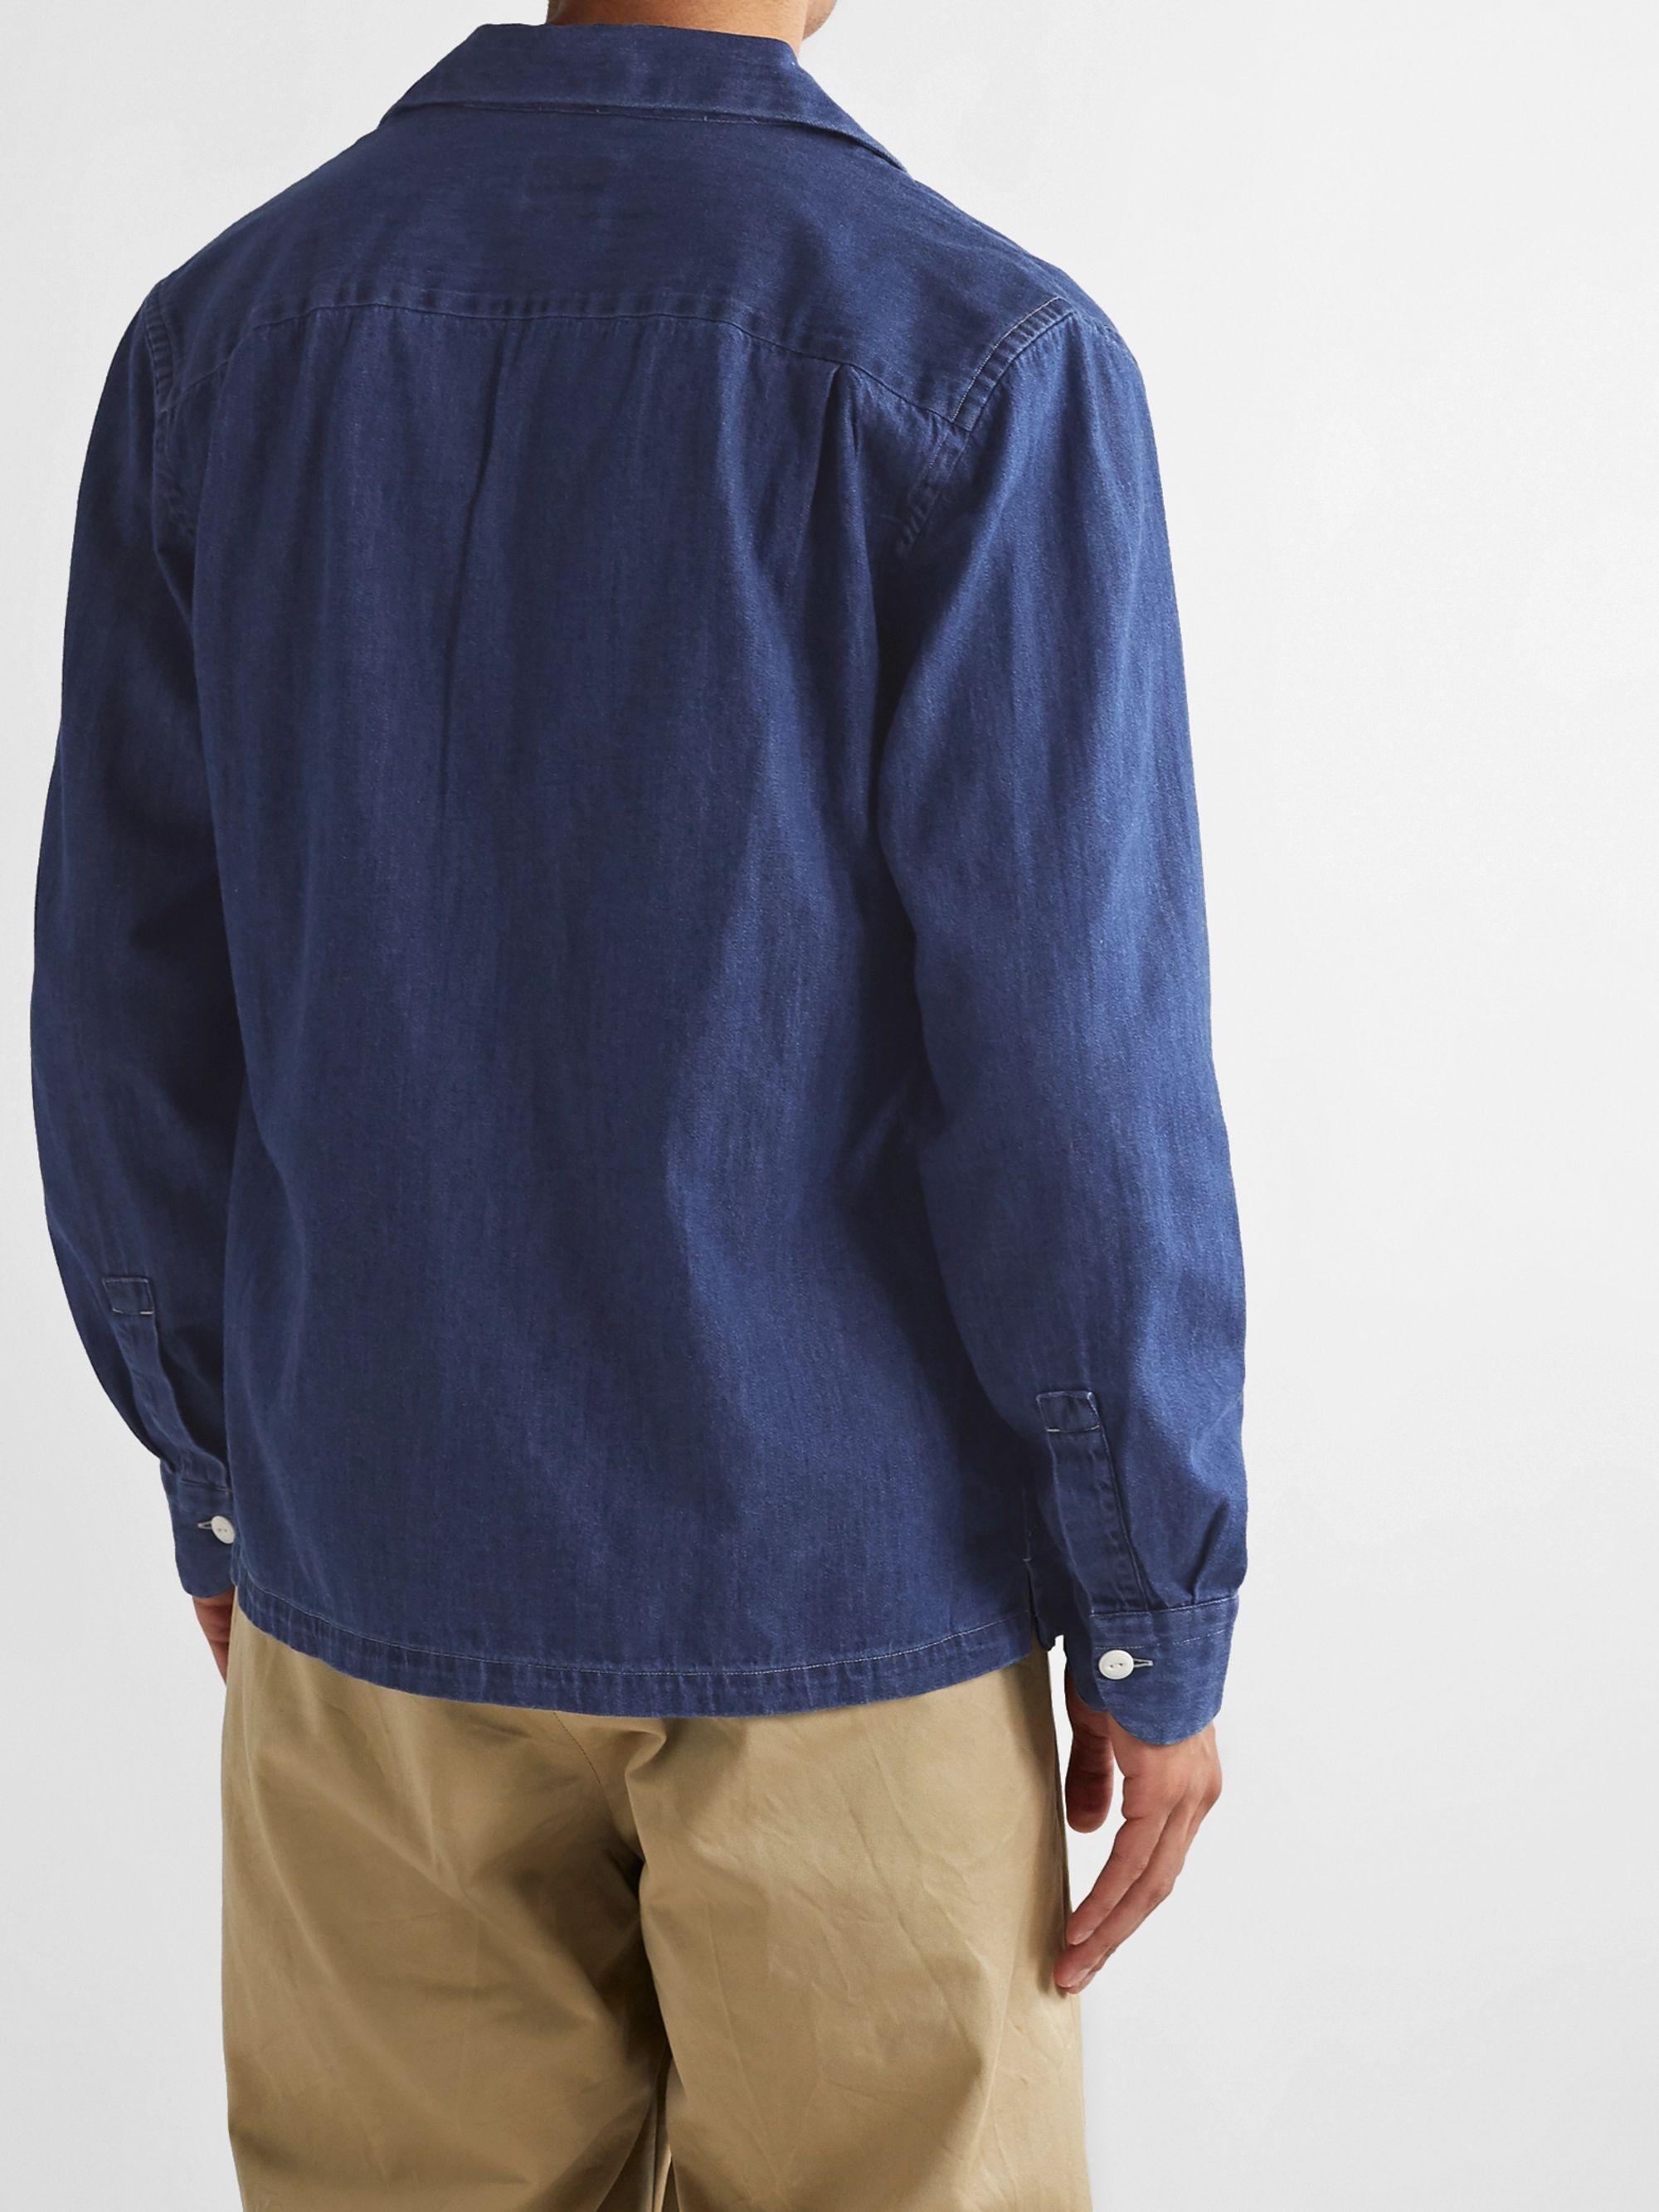 Blue Camp-collar Denim Shirt Jacket | Bellerose